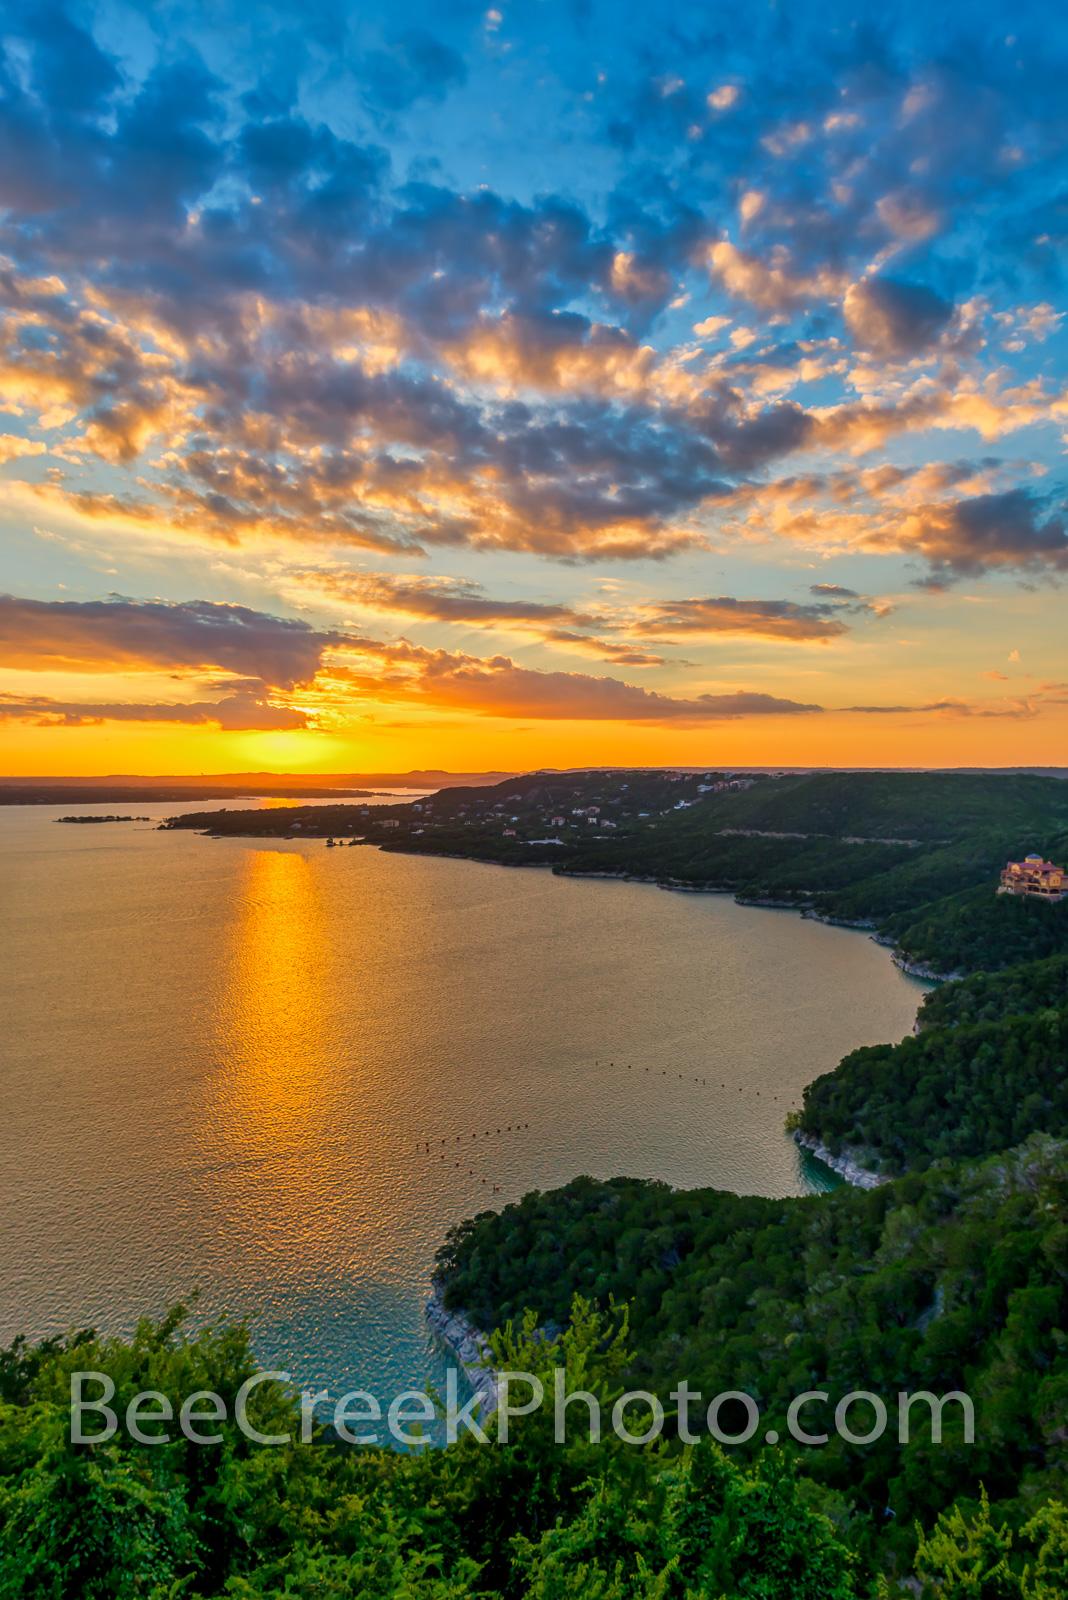 Lake Travis Sunset Vertical - A vertical capture of the sunset over lake travis.  Lake Travis is a popular destination for tourist...